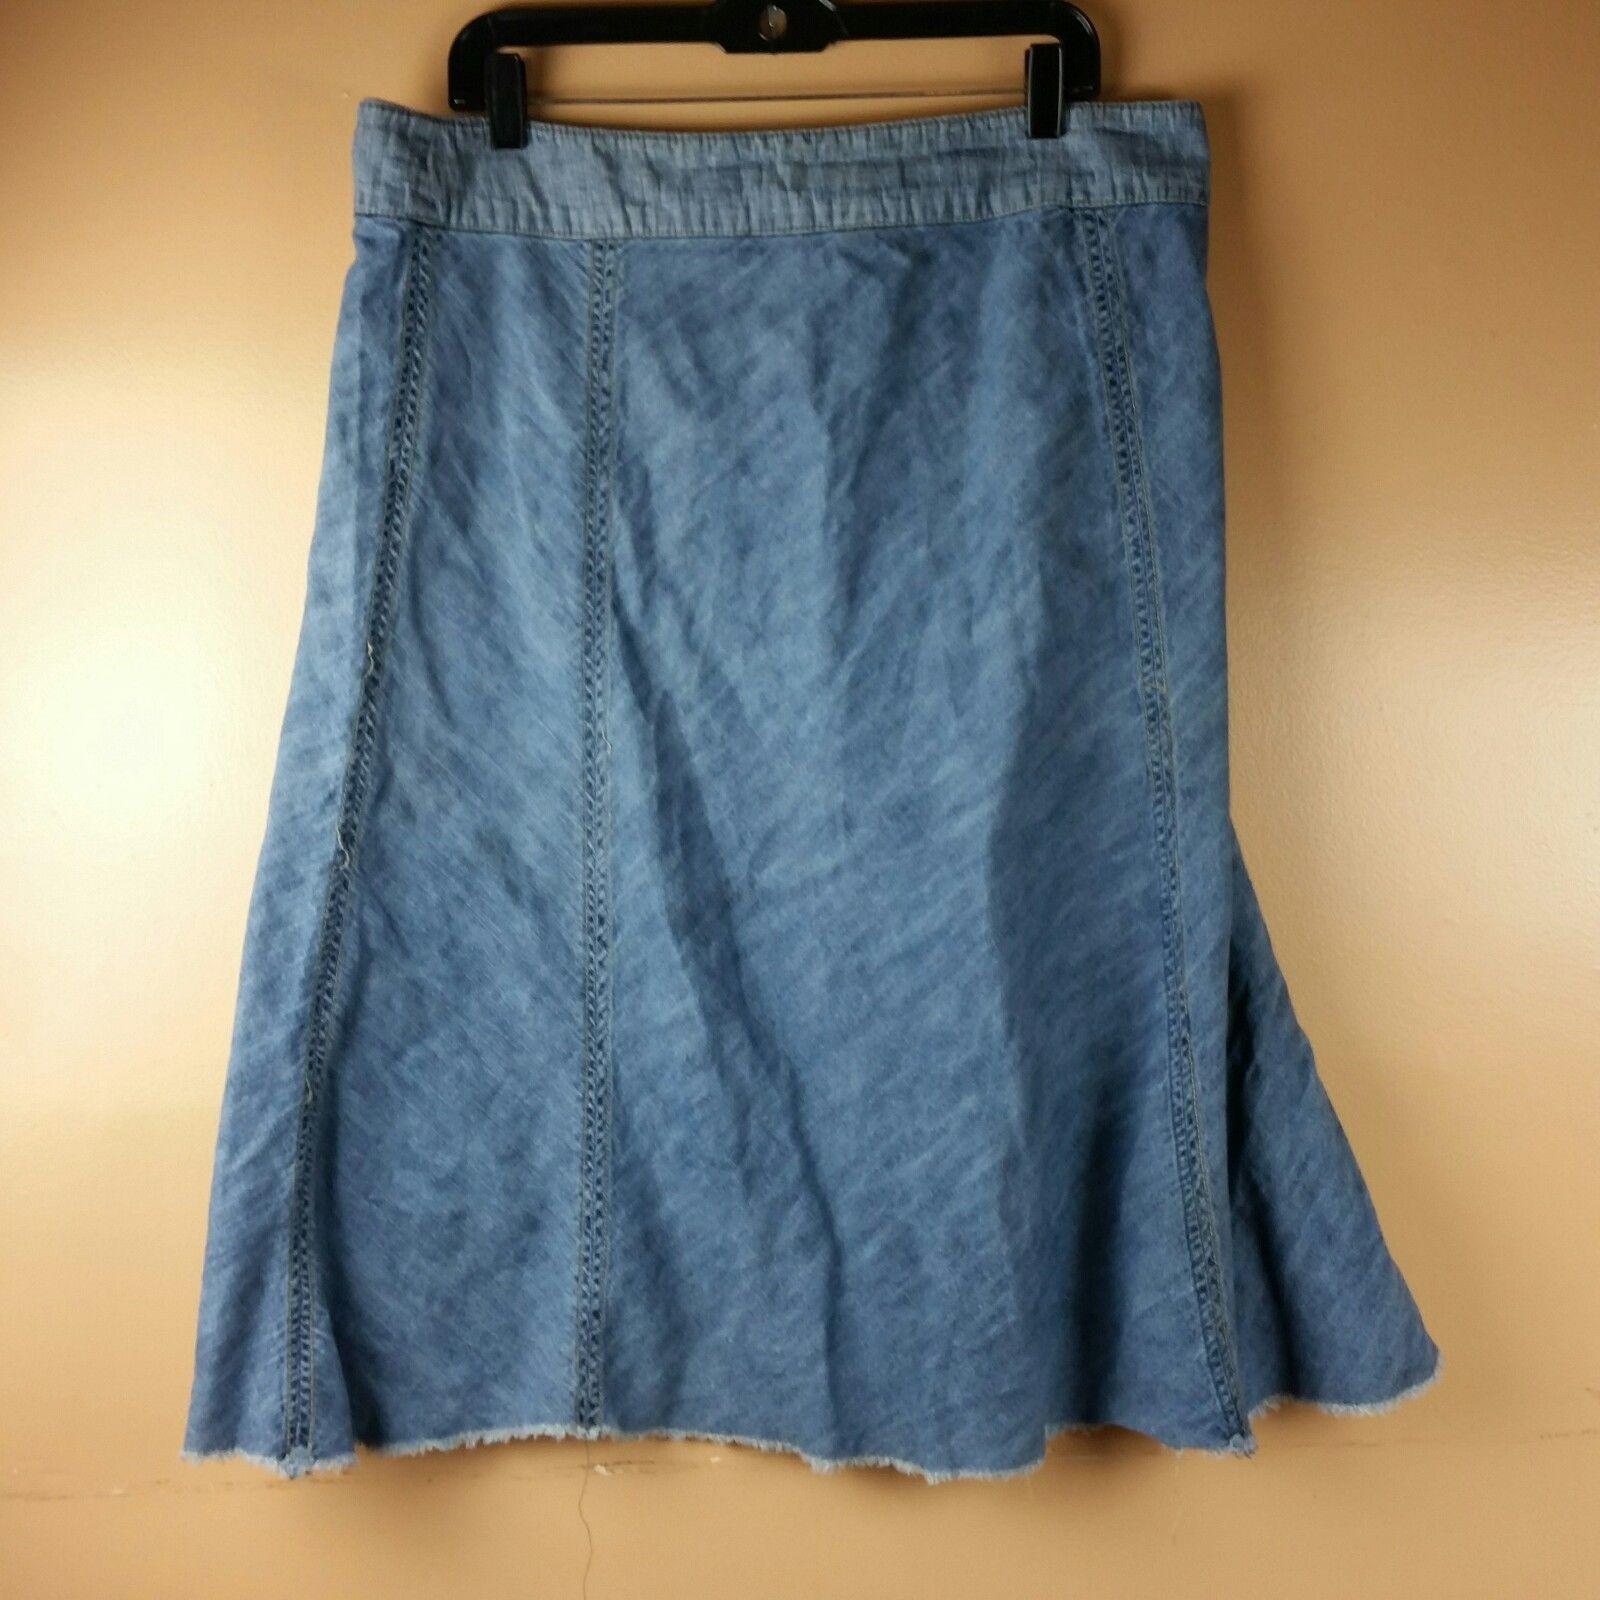 LEE Jean Skirt Womens One True Fit Modest Denim Fringe Hem Size 15/16M